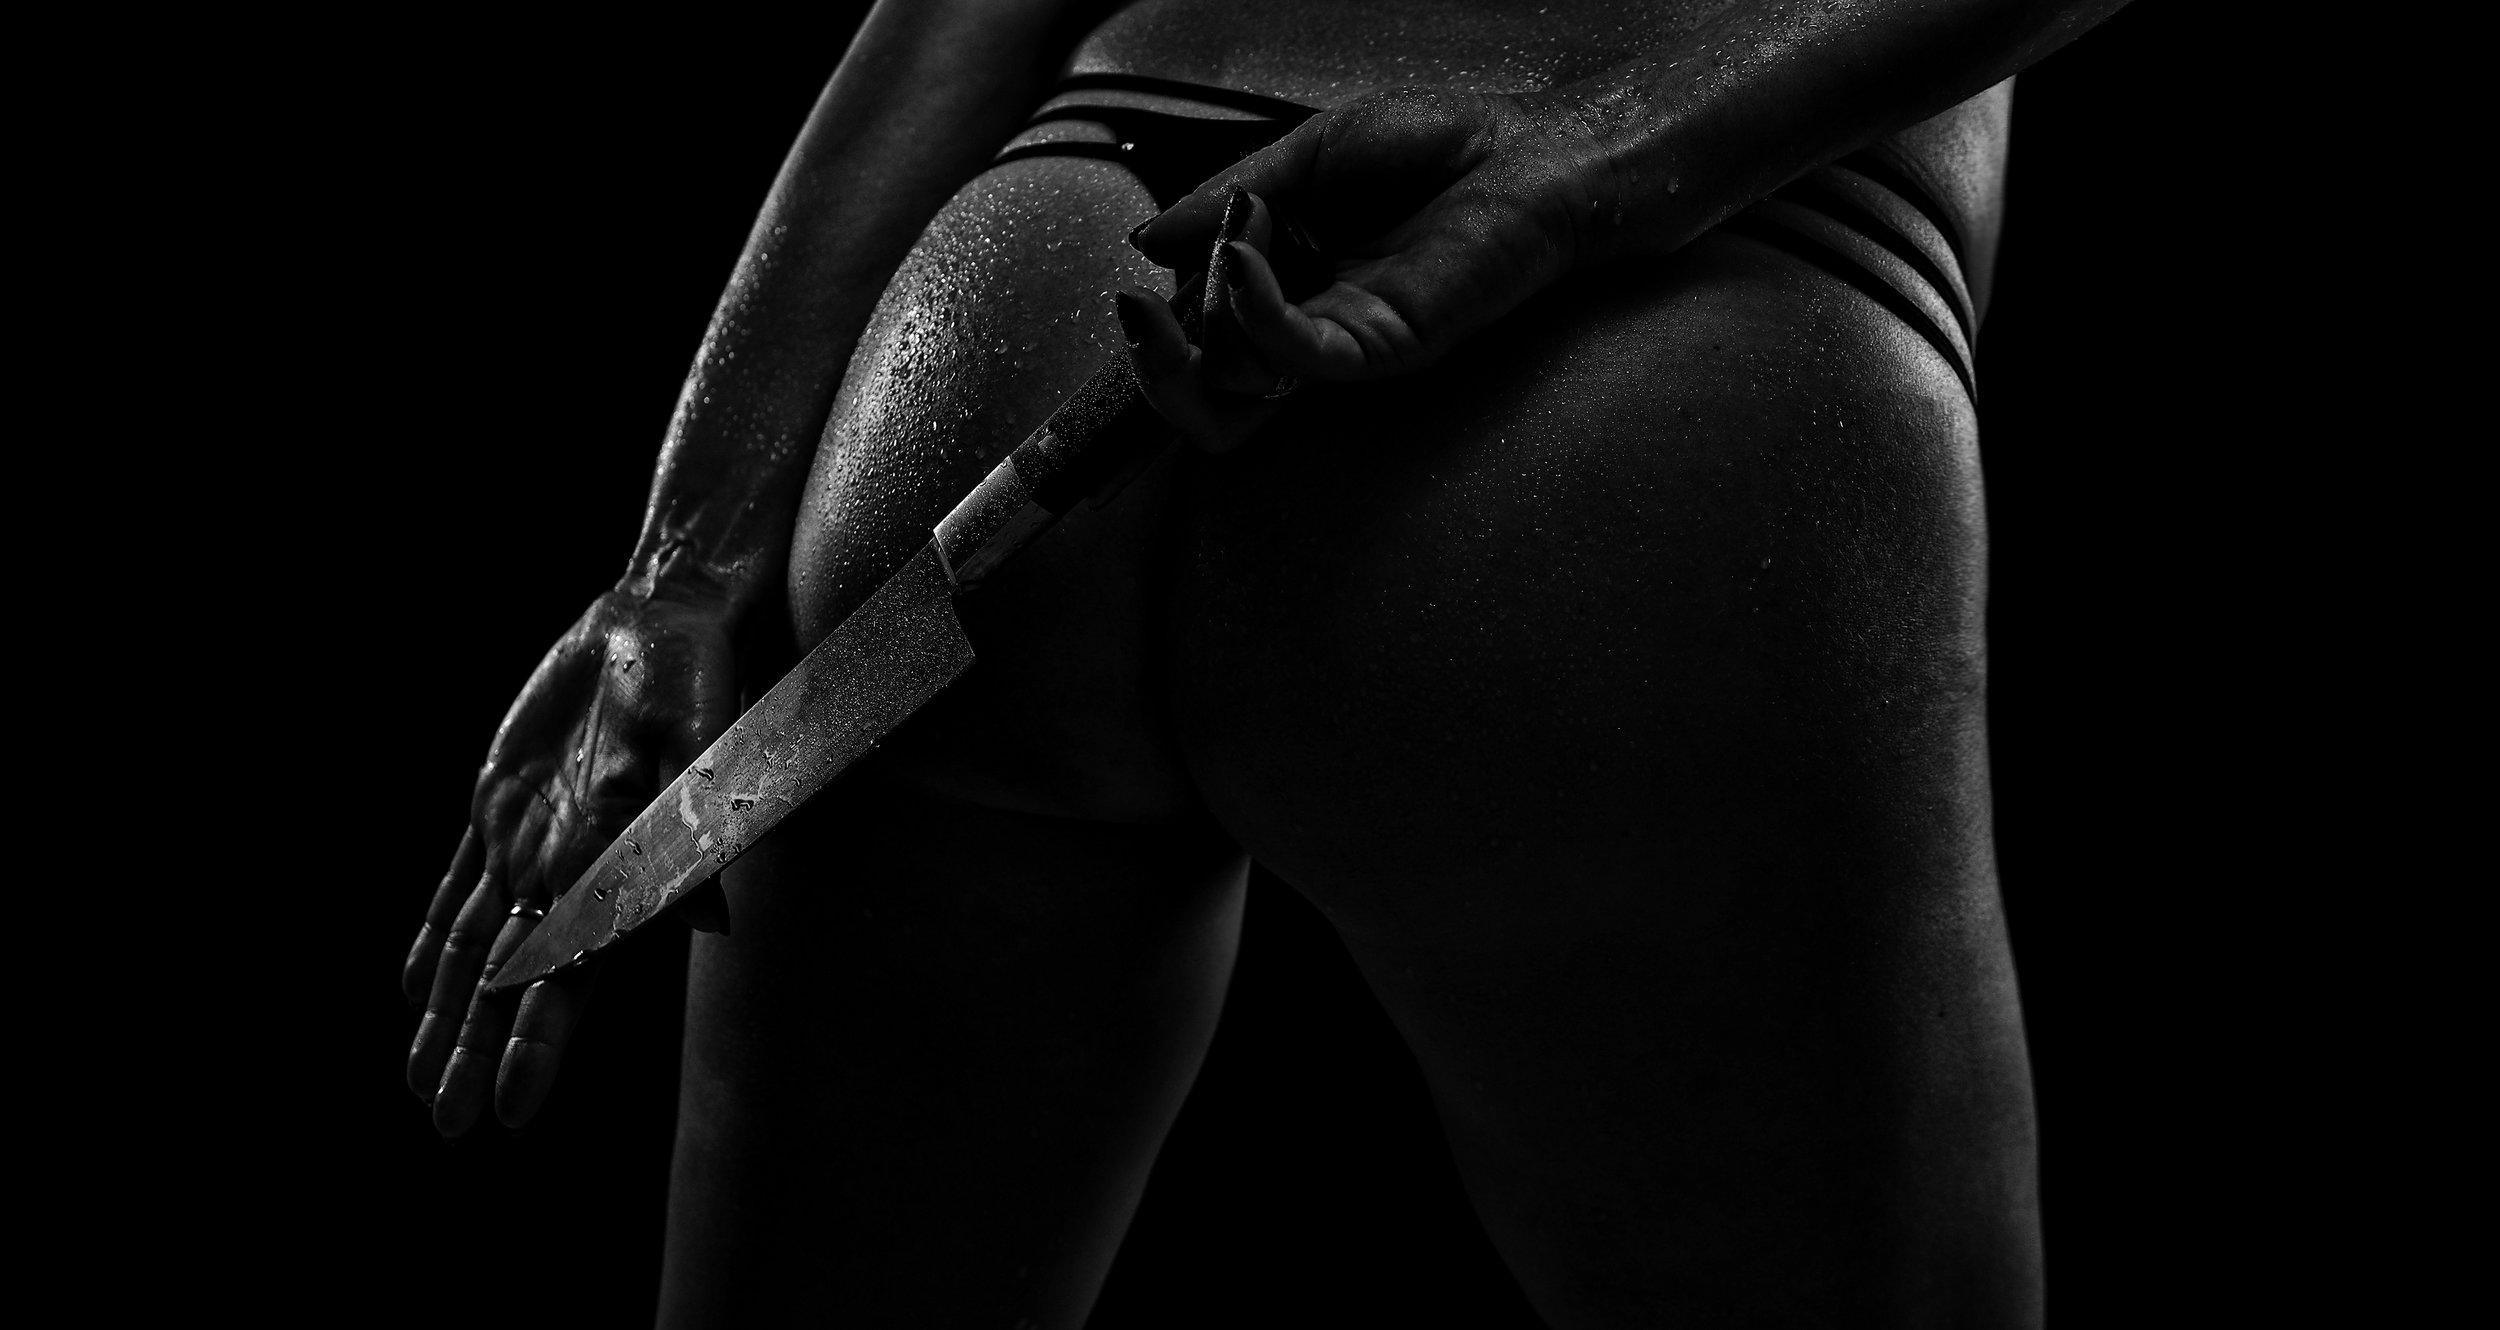 Knife Play.jpg